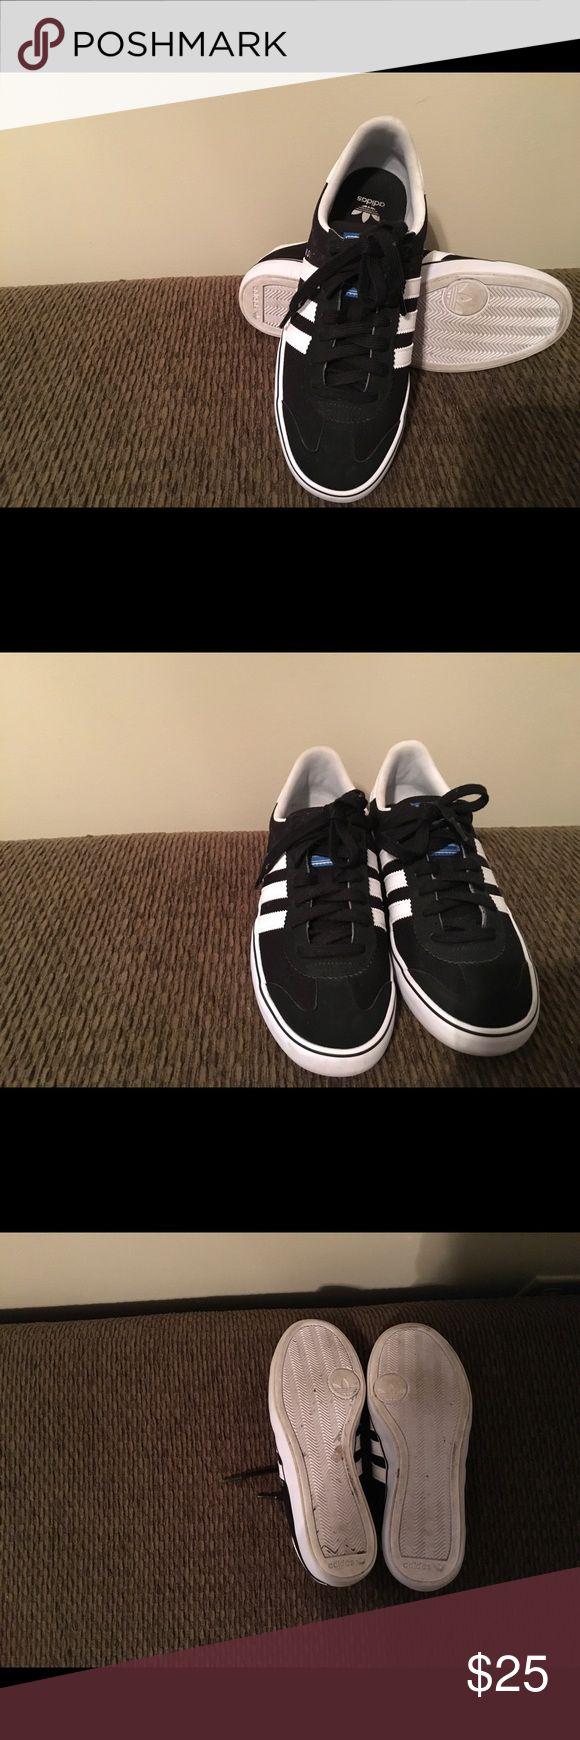 Adidas Somas Black and white Adidas Somas suede adidas Shoes Athletic Shoes